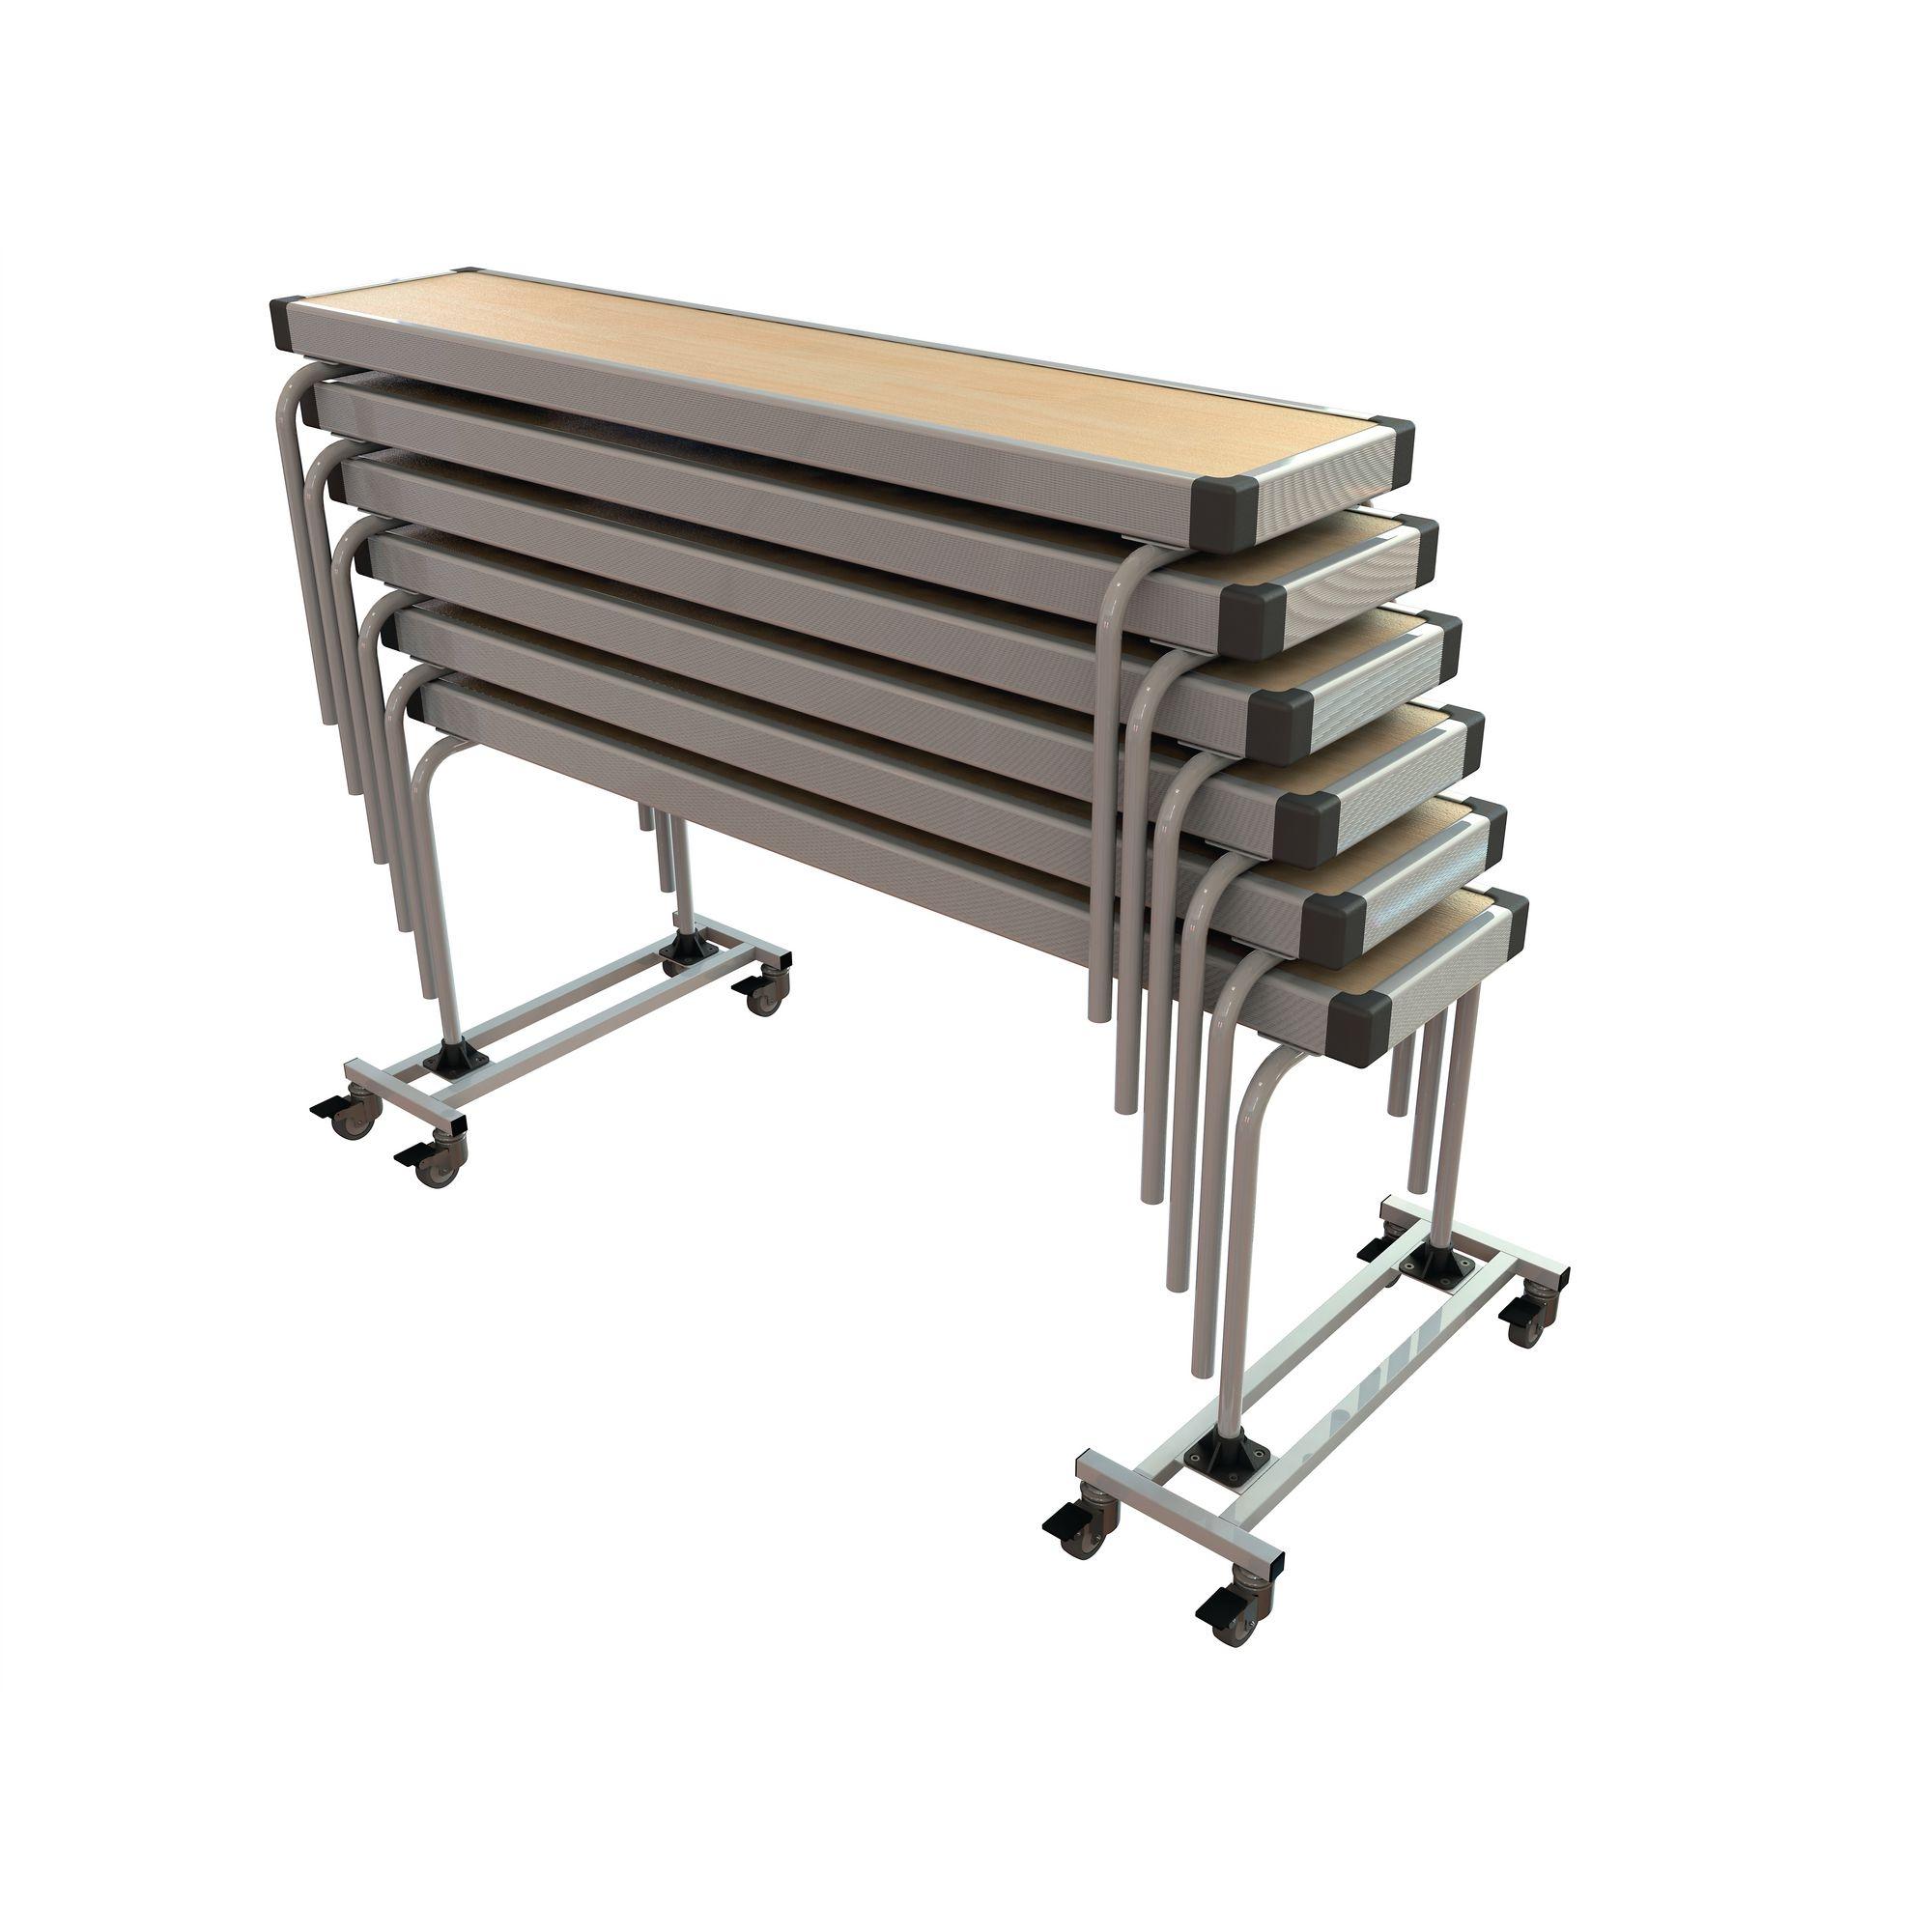 Rectangular Benches L1830 x H450 x W254mm Grey